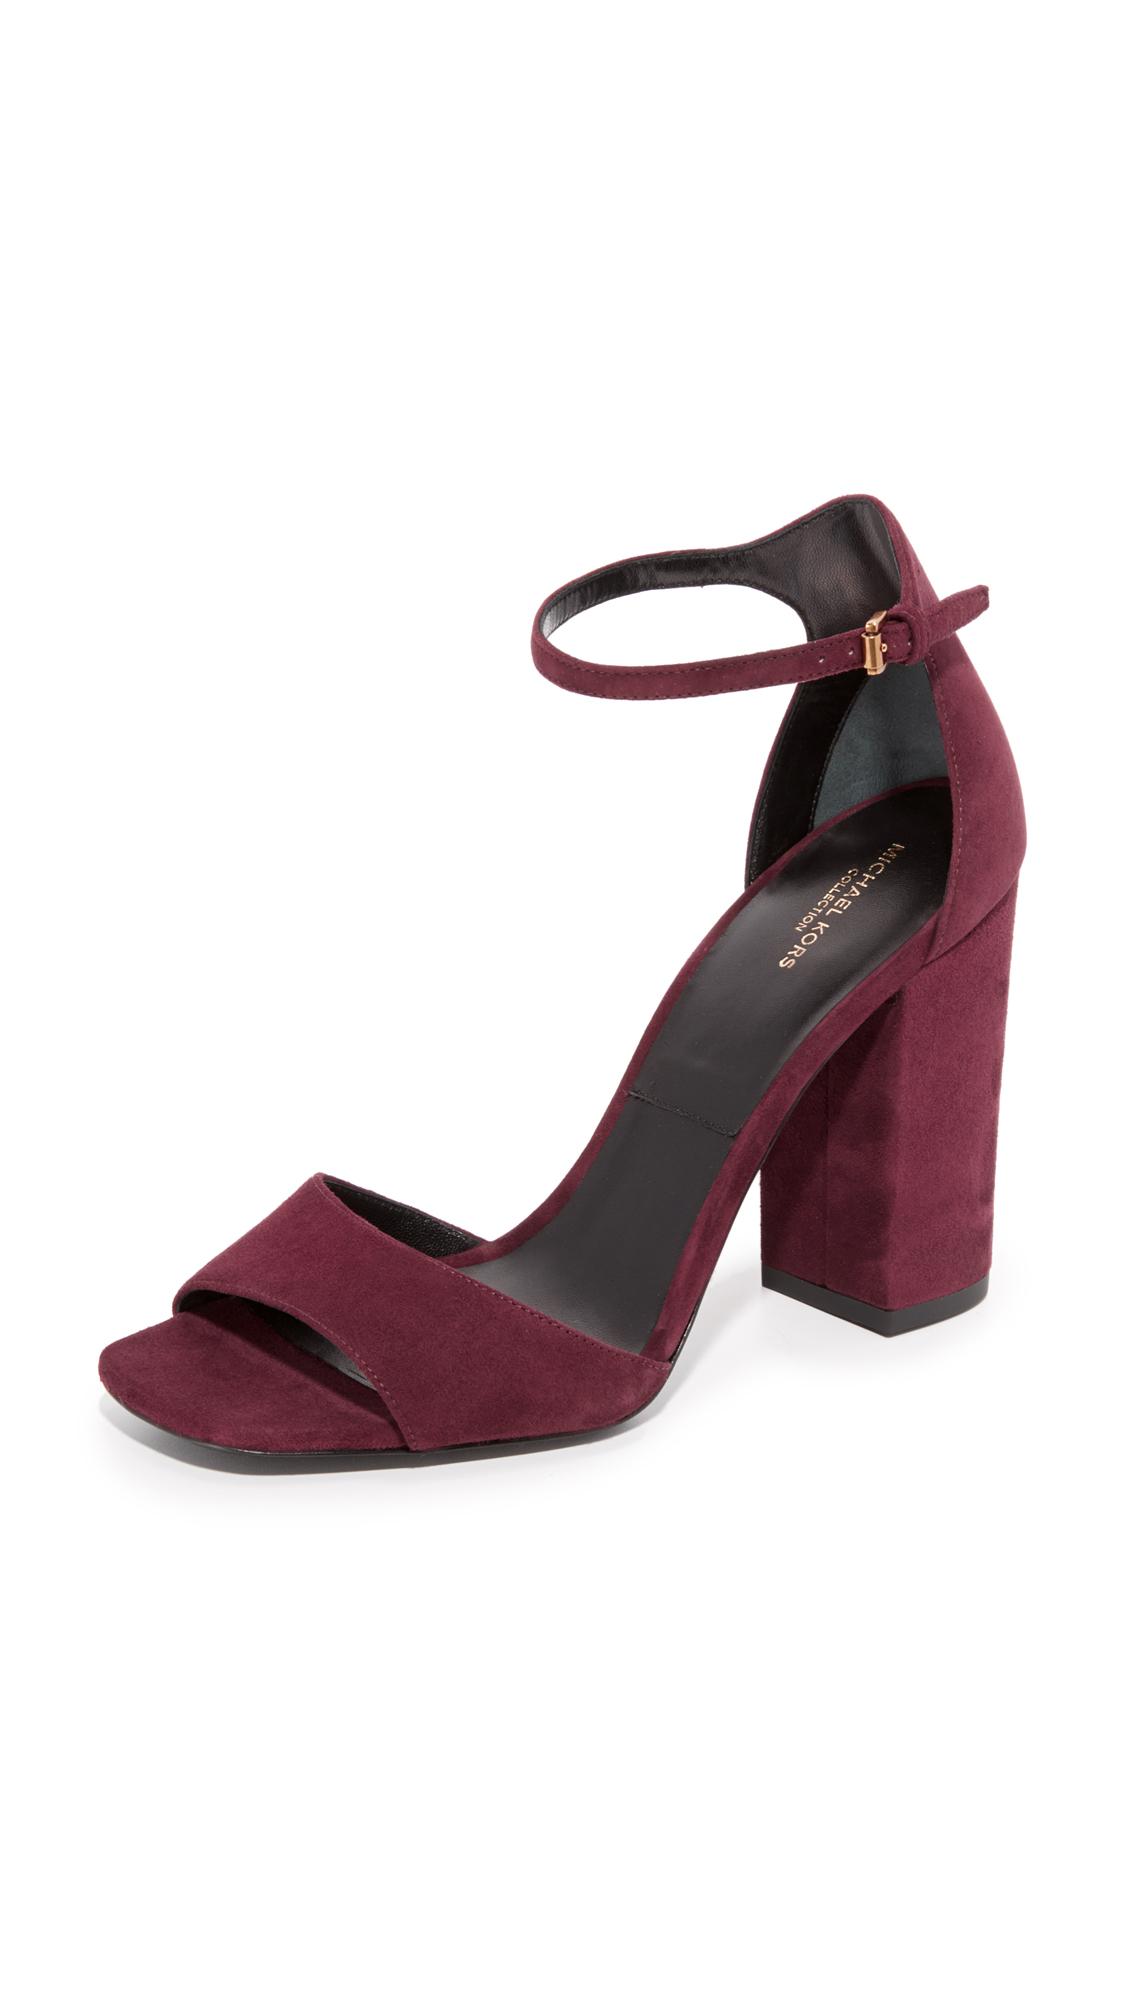 michael kors female 215965 michael kors collection rosa ankle strap sandals burgundy